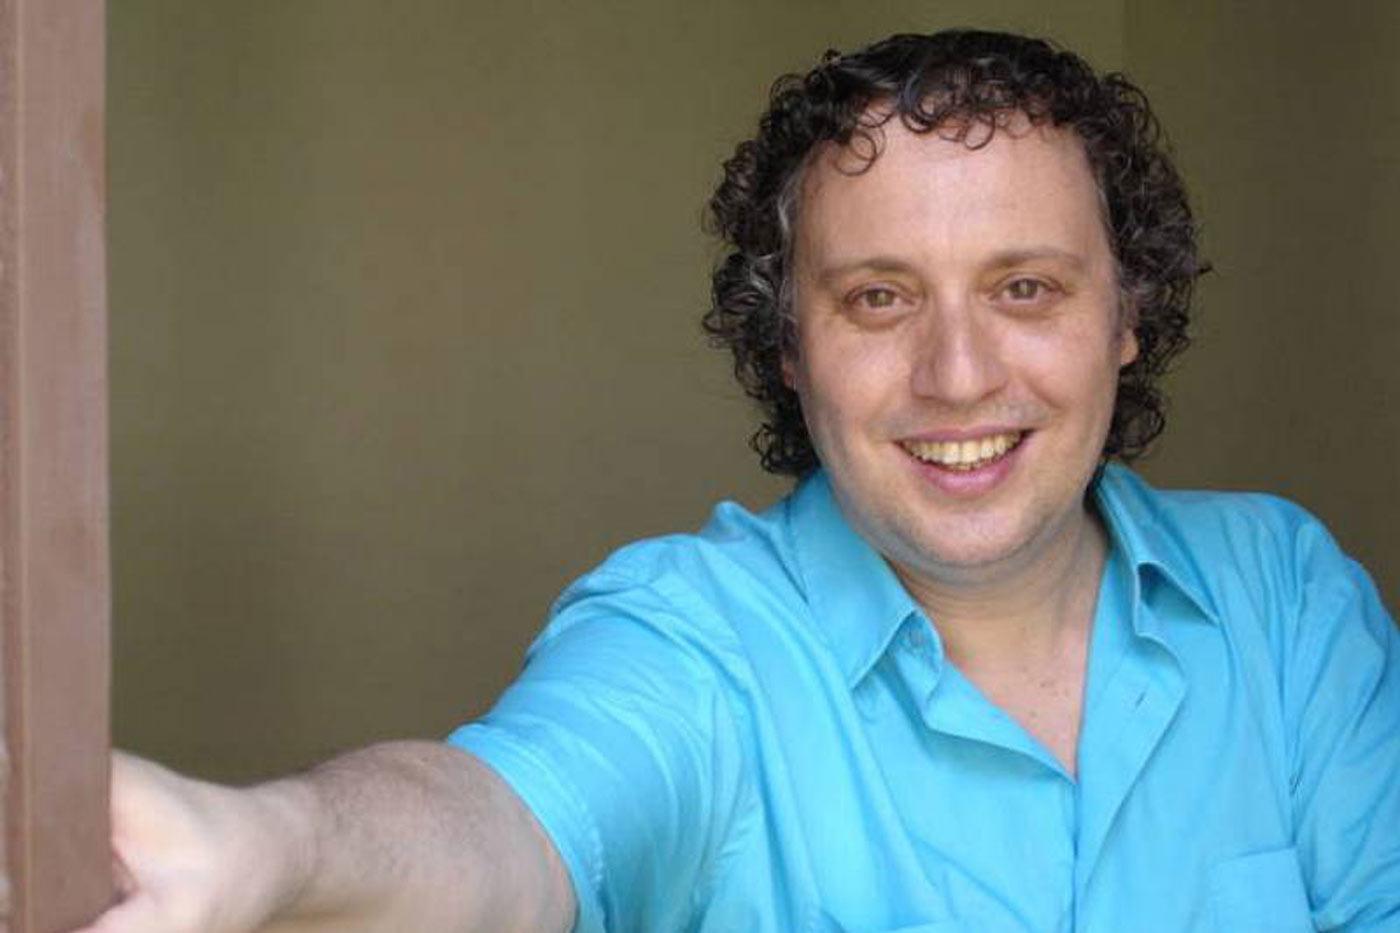 Luis Troquel estrena single